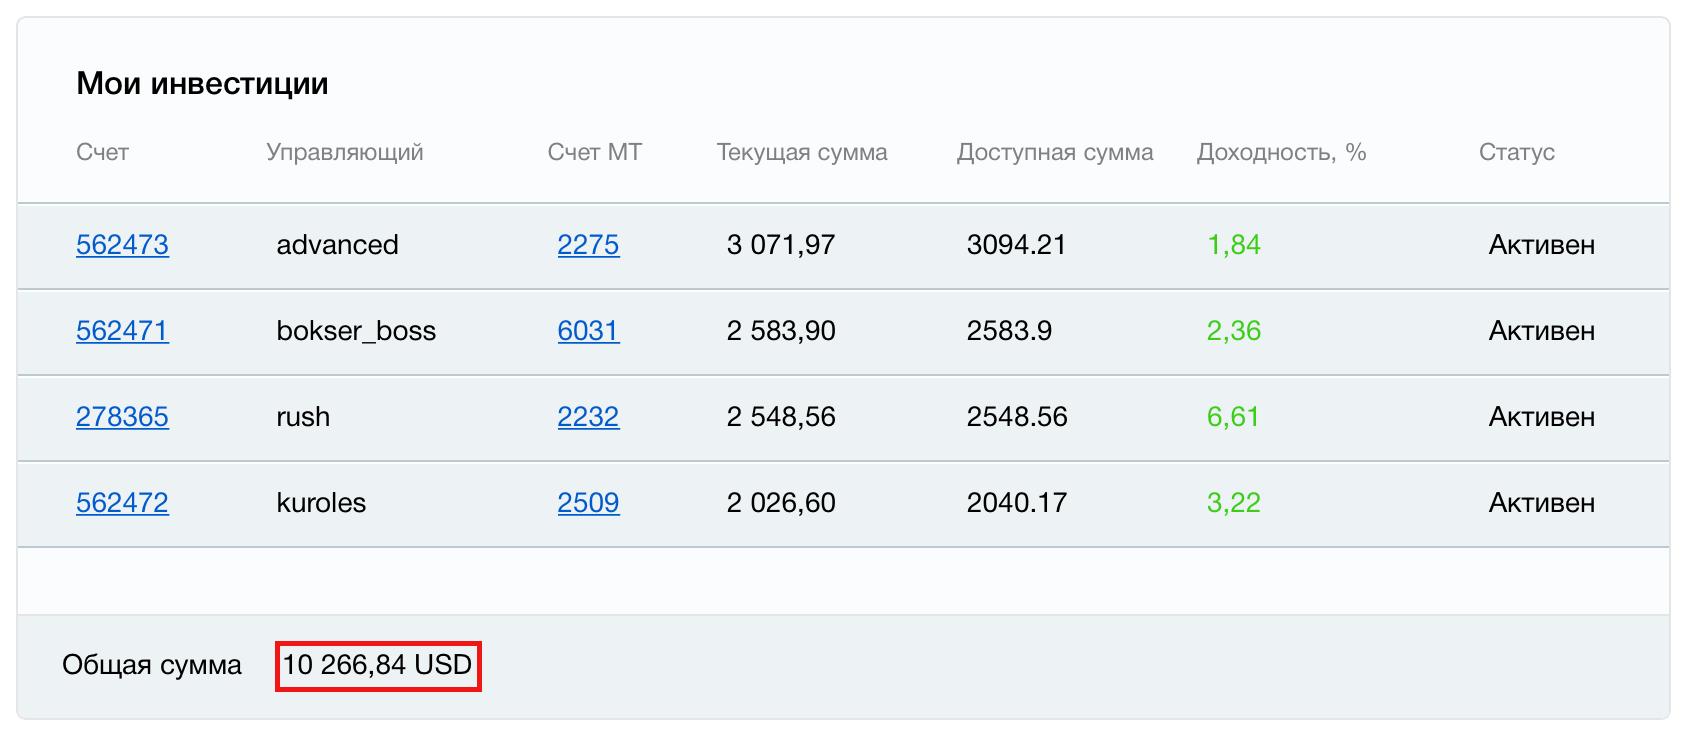 Инвестиции в ПАММ-счета PrivateFX